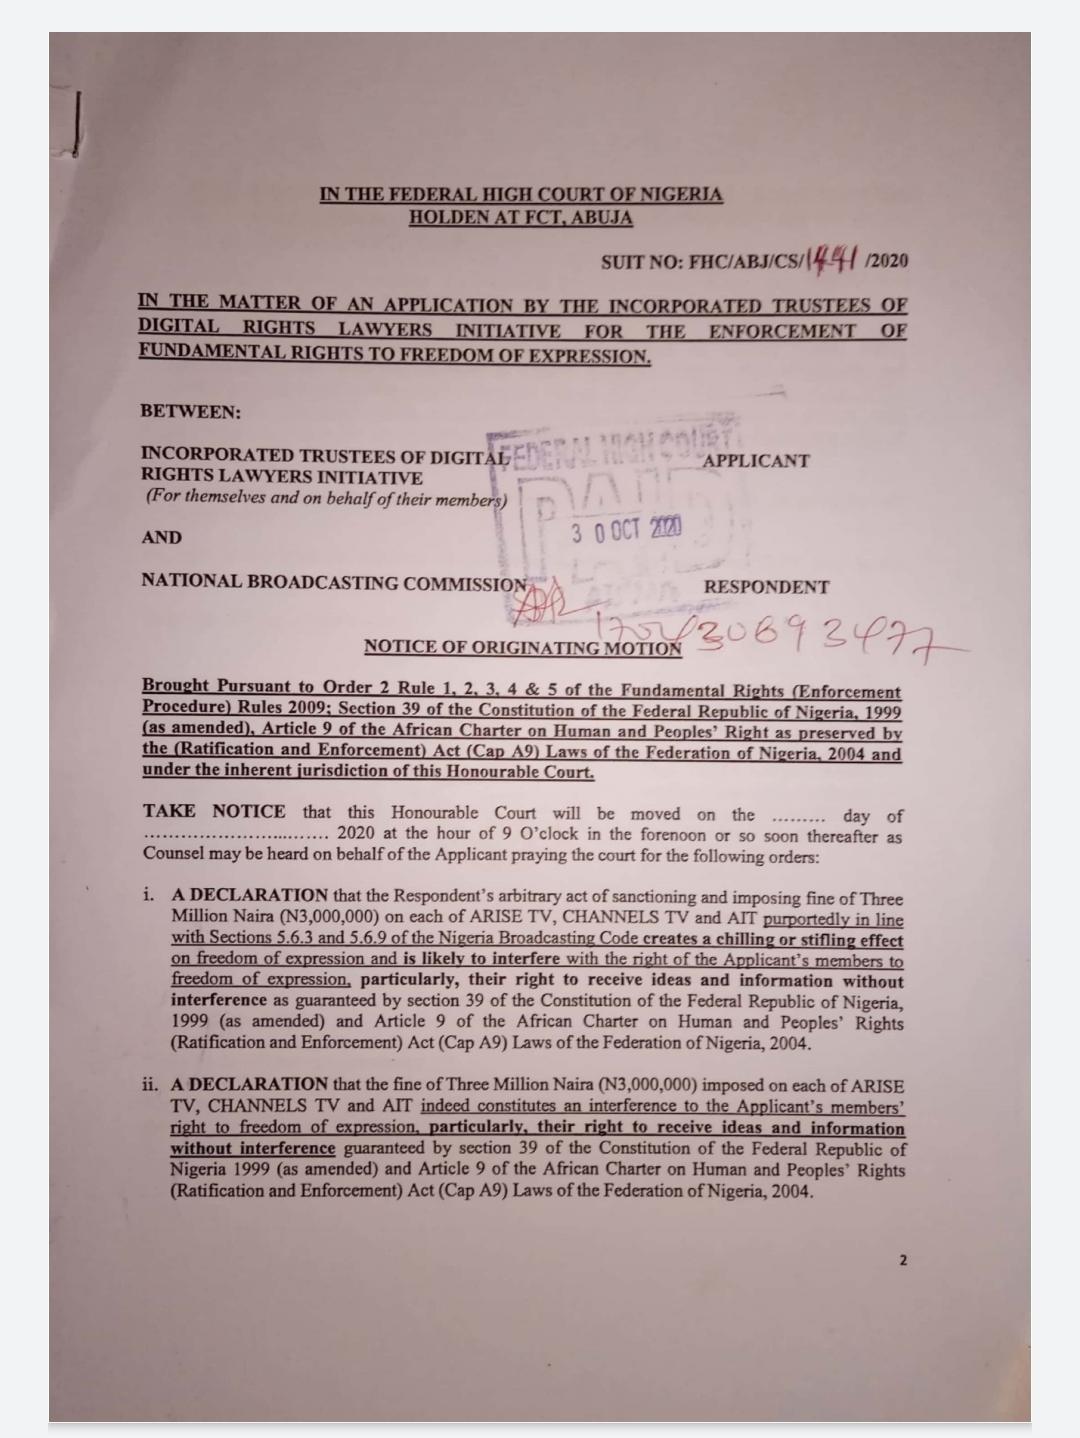 DRLI sues NBC over punitive fines against ARISE TV, Channels TV and AIT